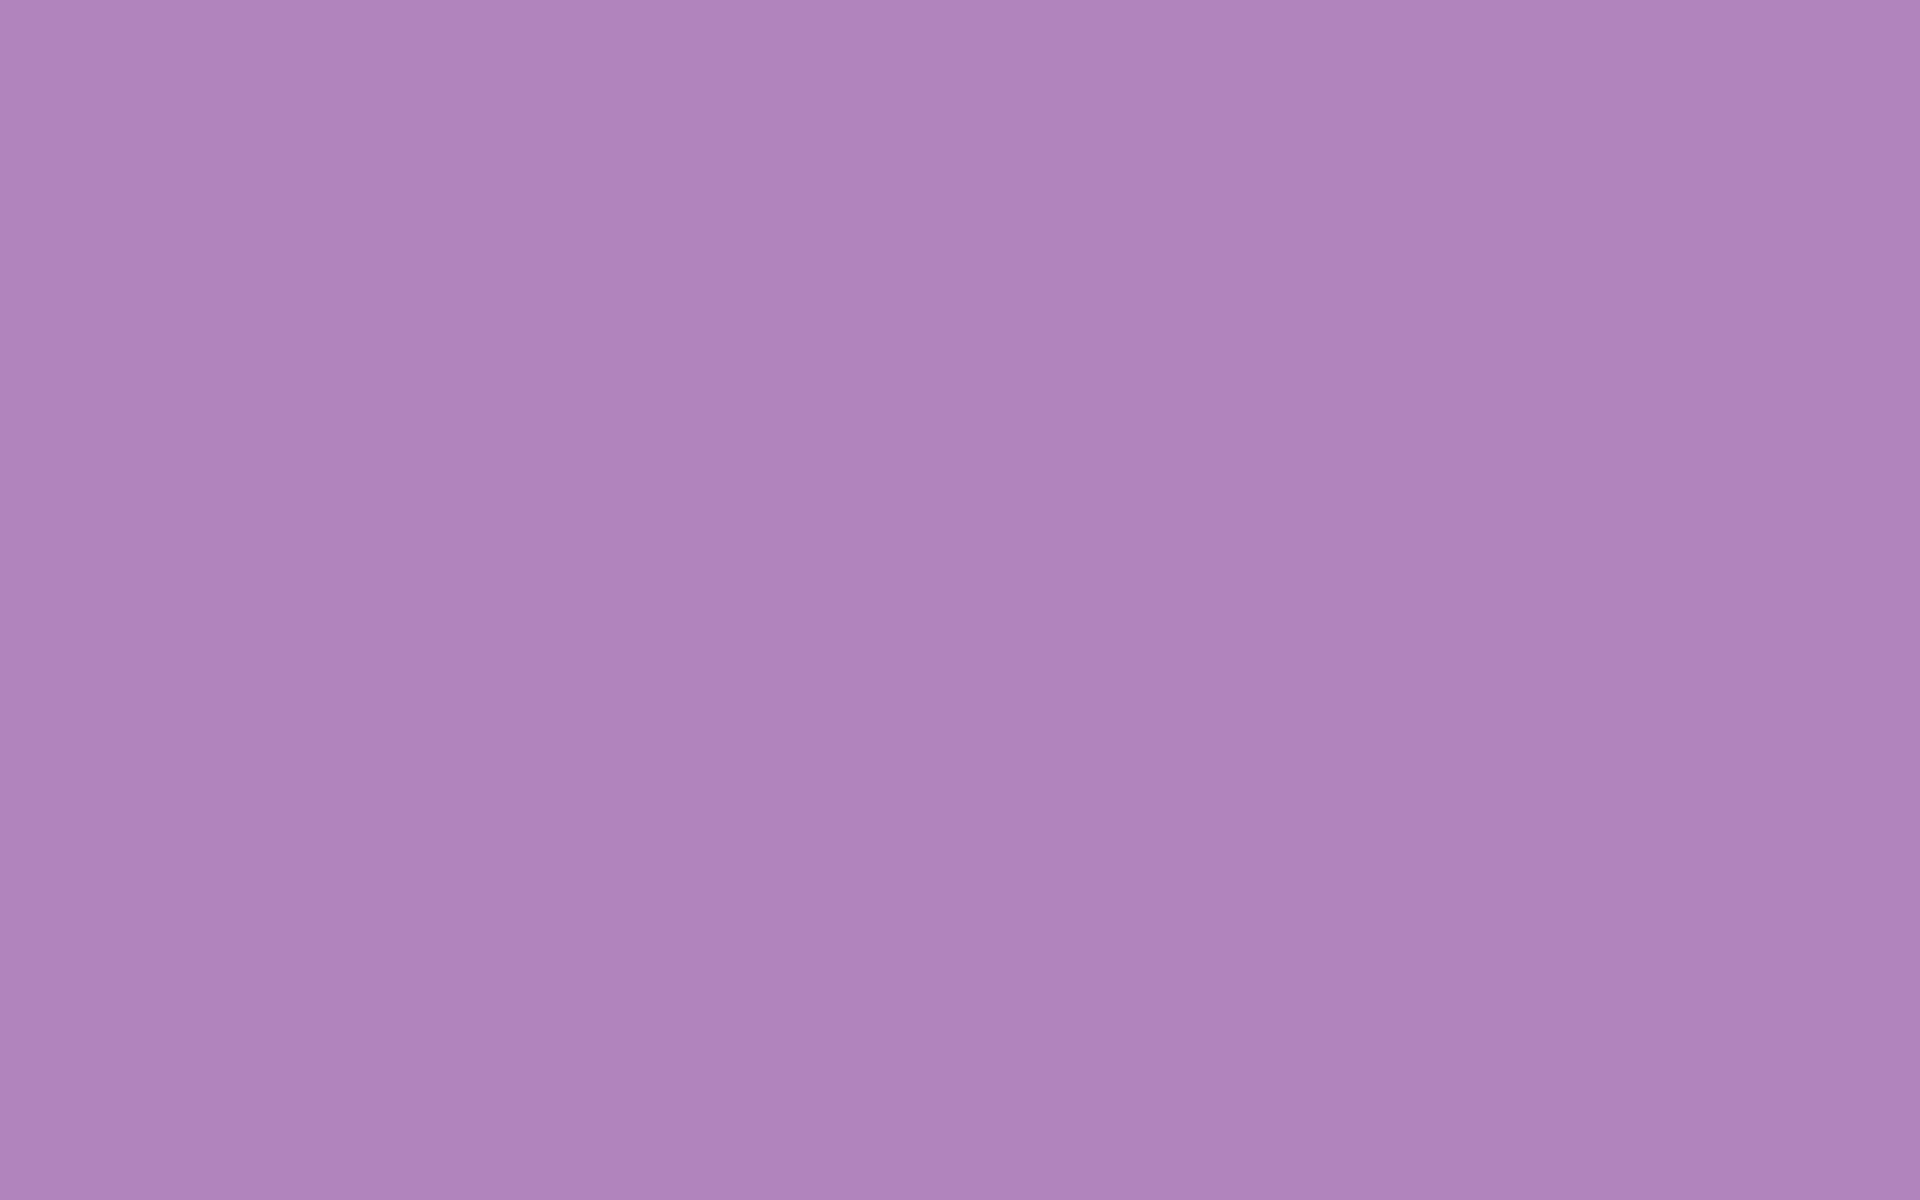 1920x1200 African Violet Solid Color Background